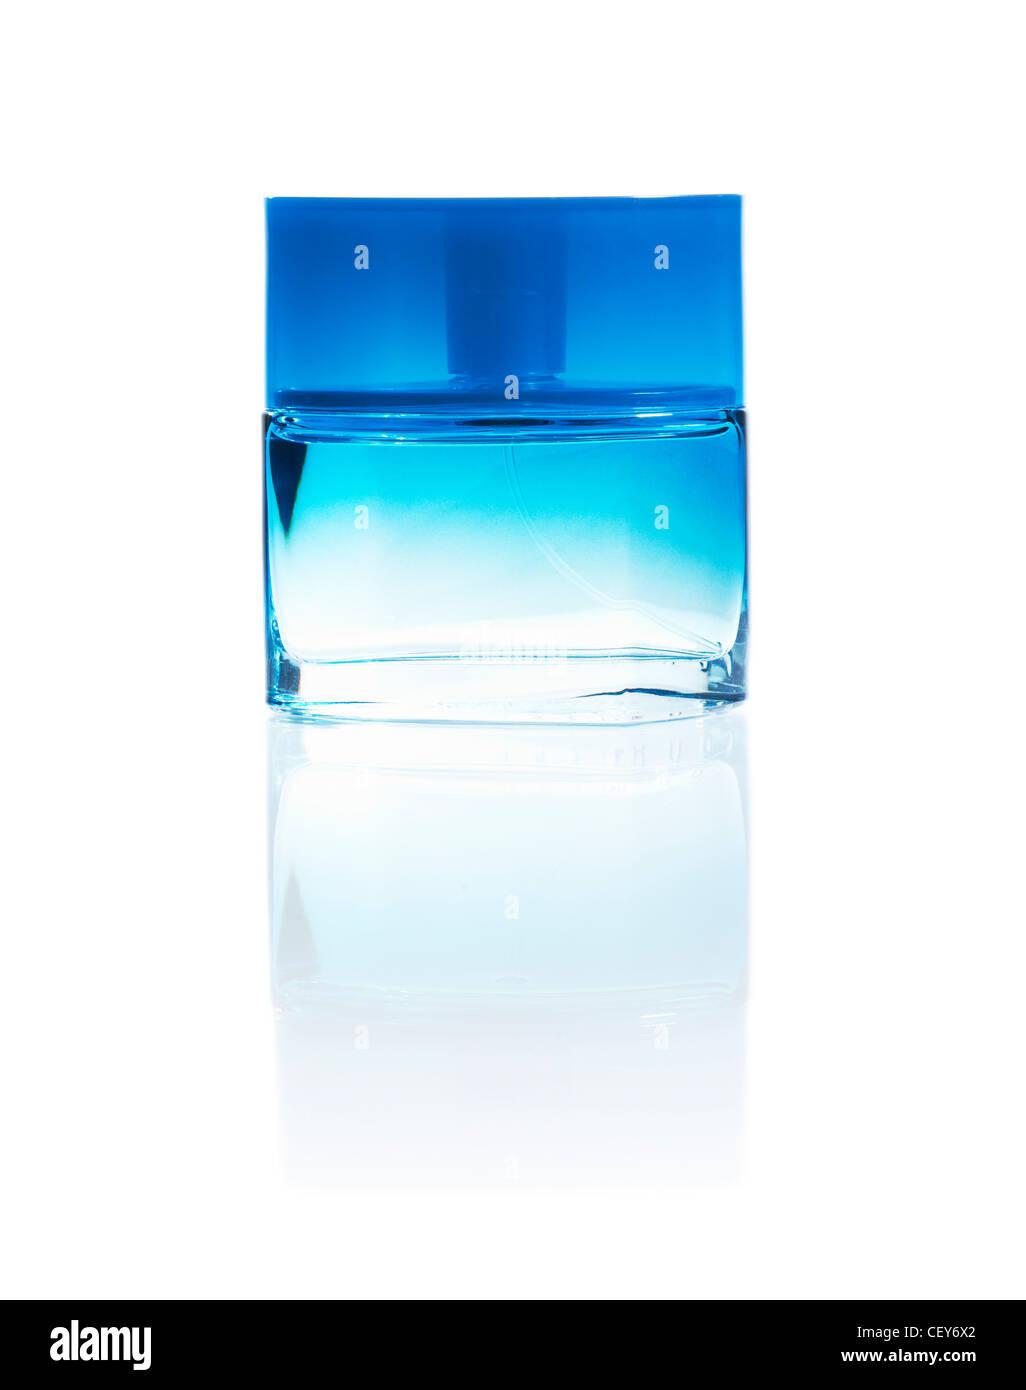 Blue perfume bottle with reflection isolated of white - Stock Image